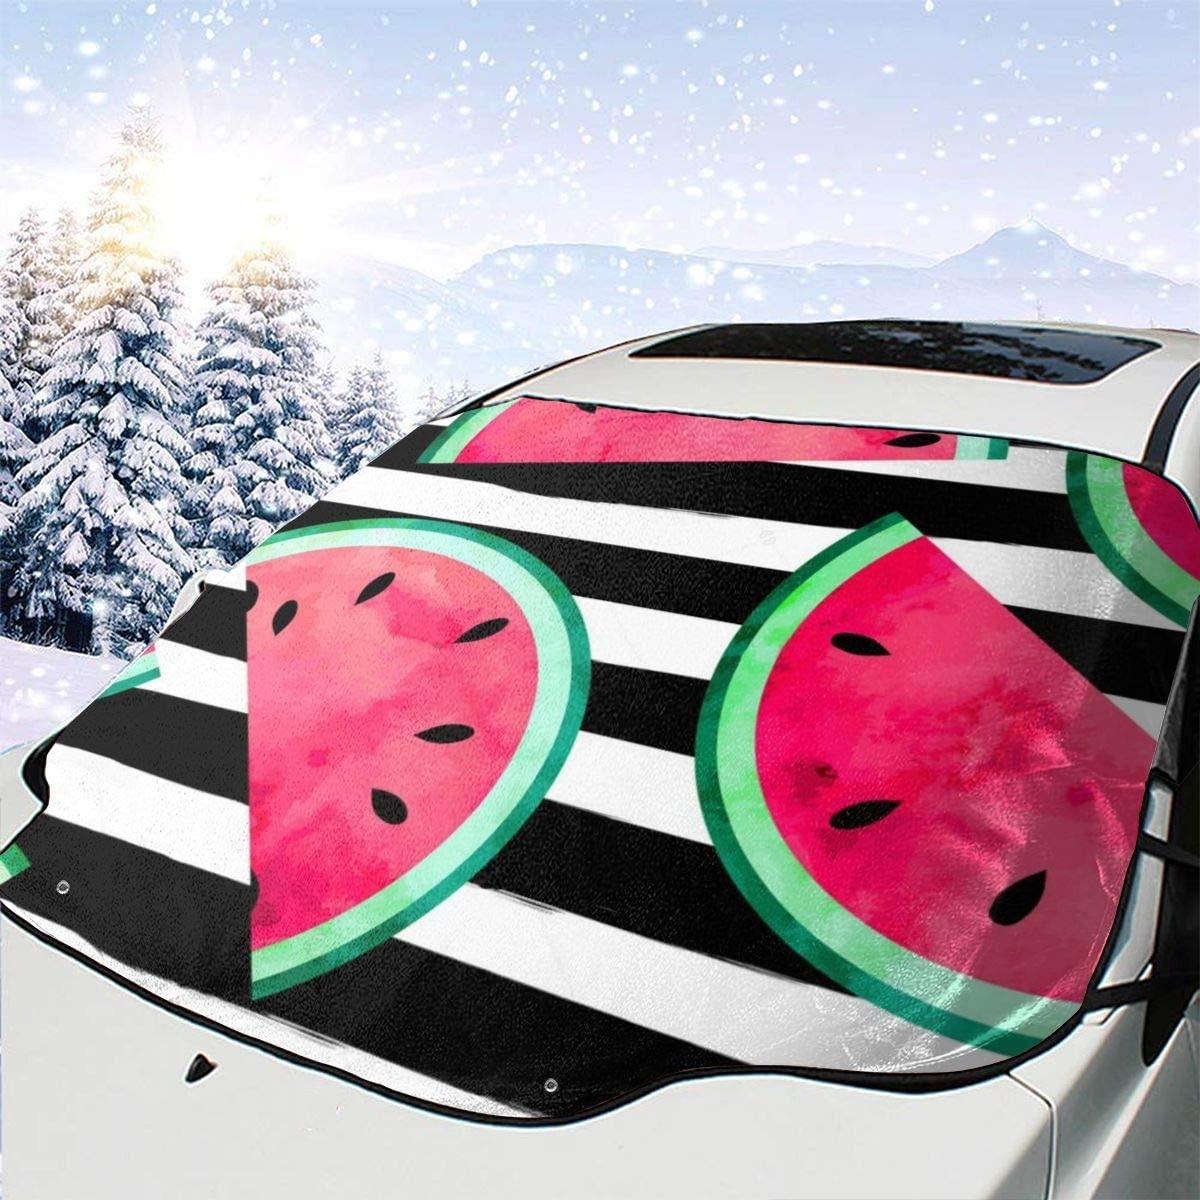 THONFIRE Car Front Window Windshields Snow Sun Shade Fruity Watermelon Stripe Cover Waterproof Blocks UV Rays Keeps Your Vehicle Cool Visor Protector Trucks Spring Heat Insulation